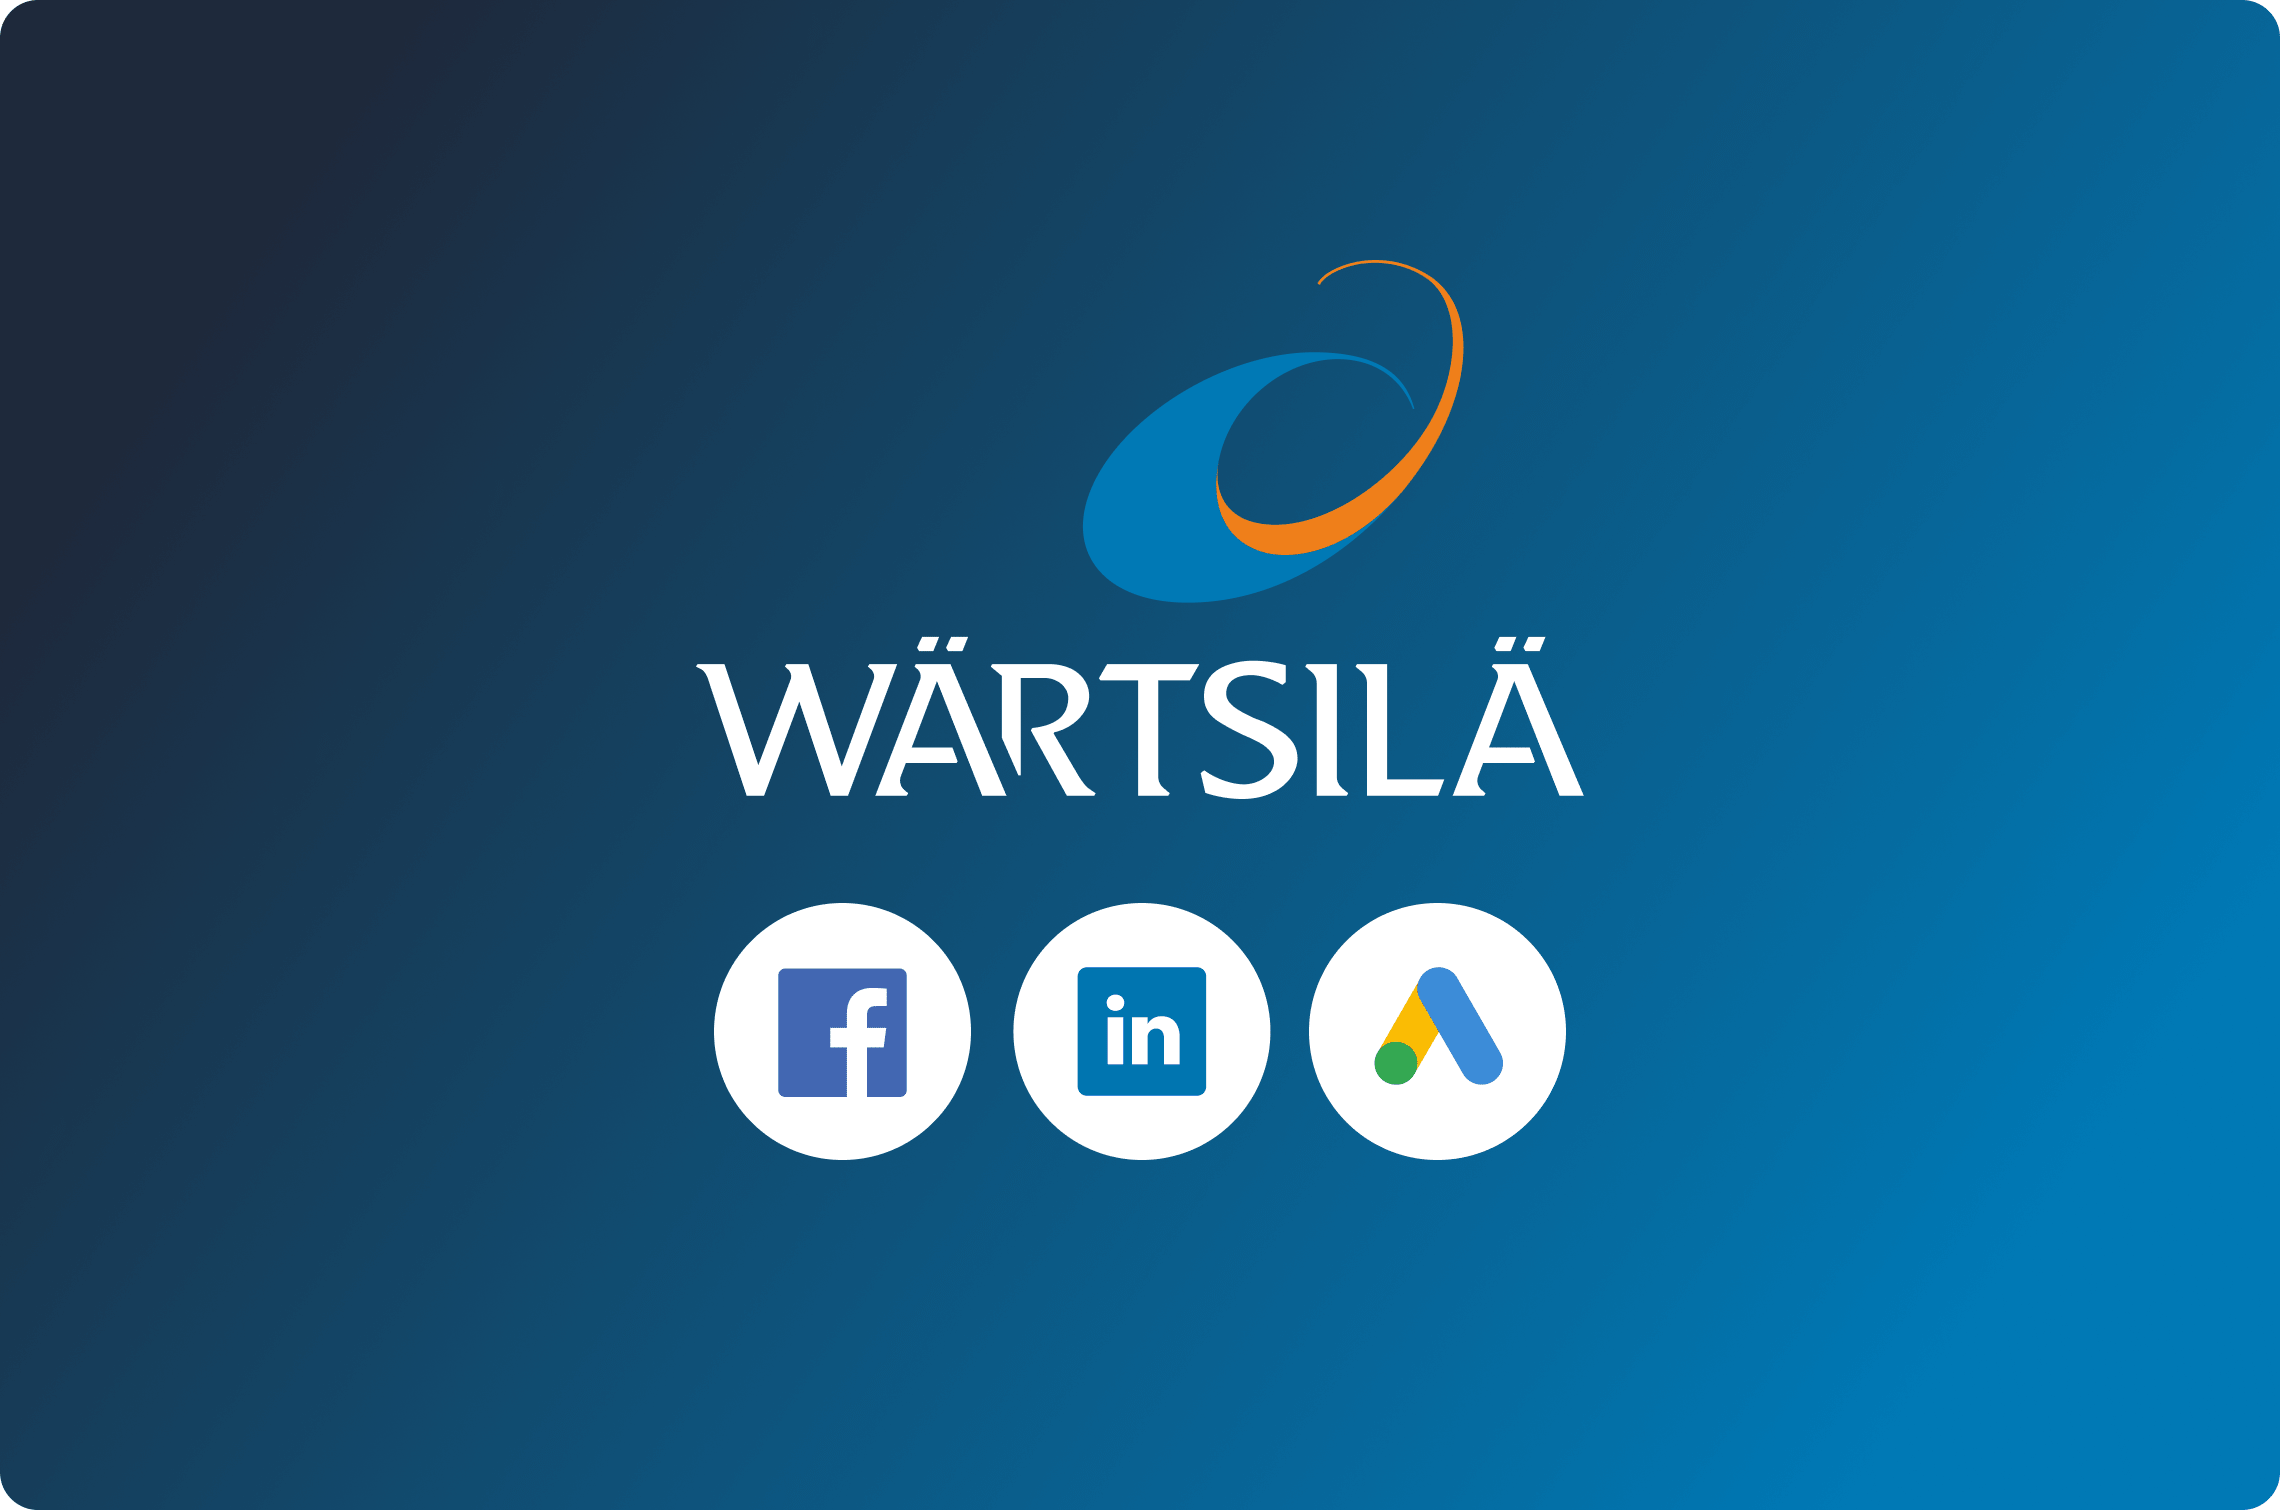 How Wartsila Uses Dataddo to Apply the REAN Marketing Model